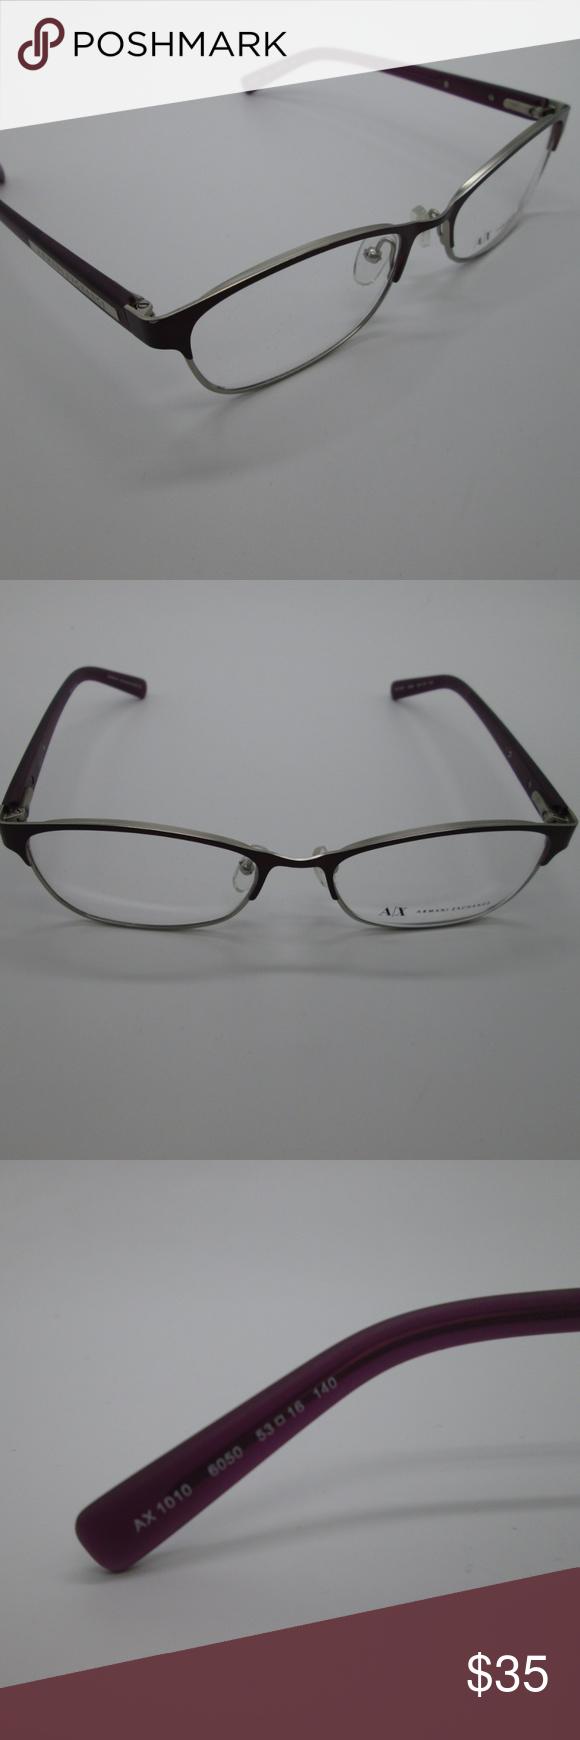 124bc933bb Armani Exchange AX1010 Women s Eyeglasses DAM237 Armani Exchange AX1010  6050 Women s Eyeglasses DAM237 Good